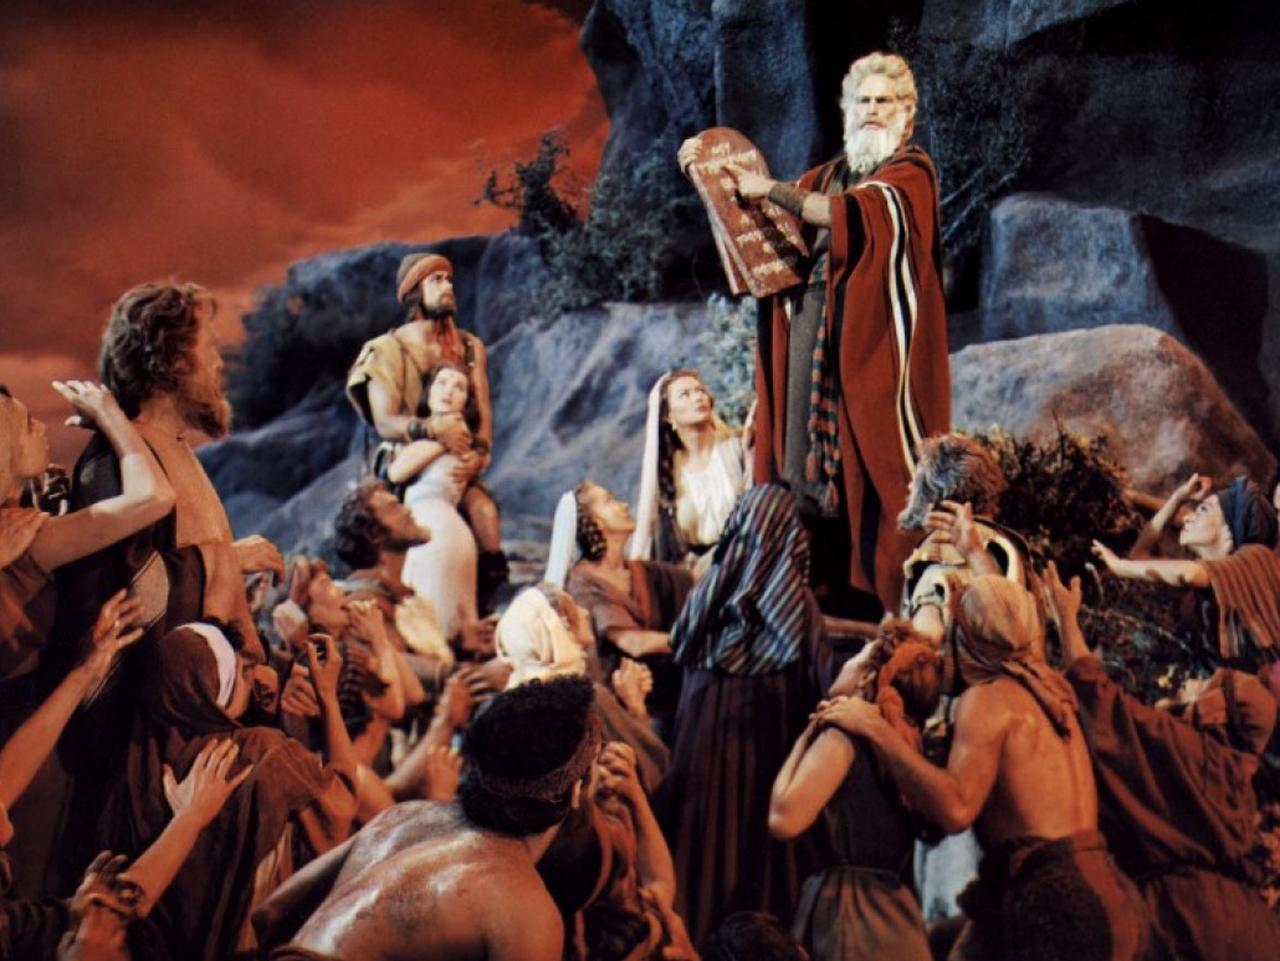 Ten Commandments History Channel